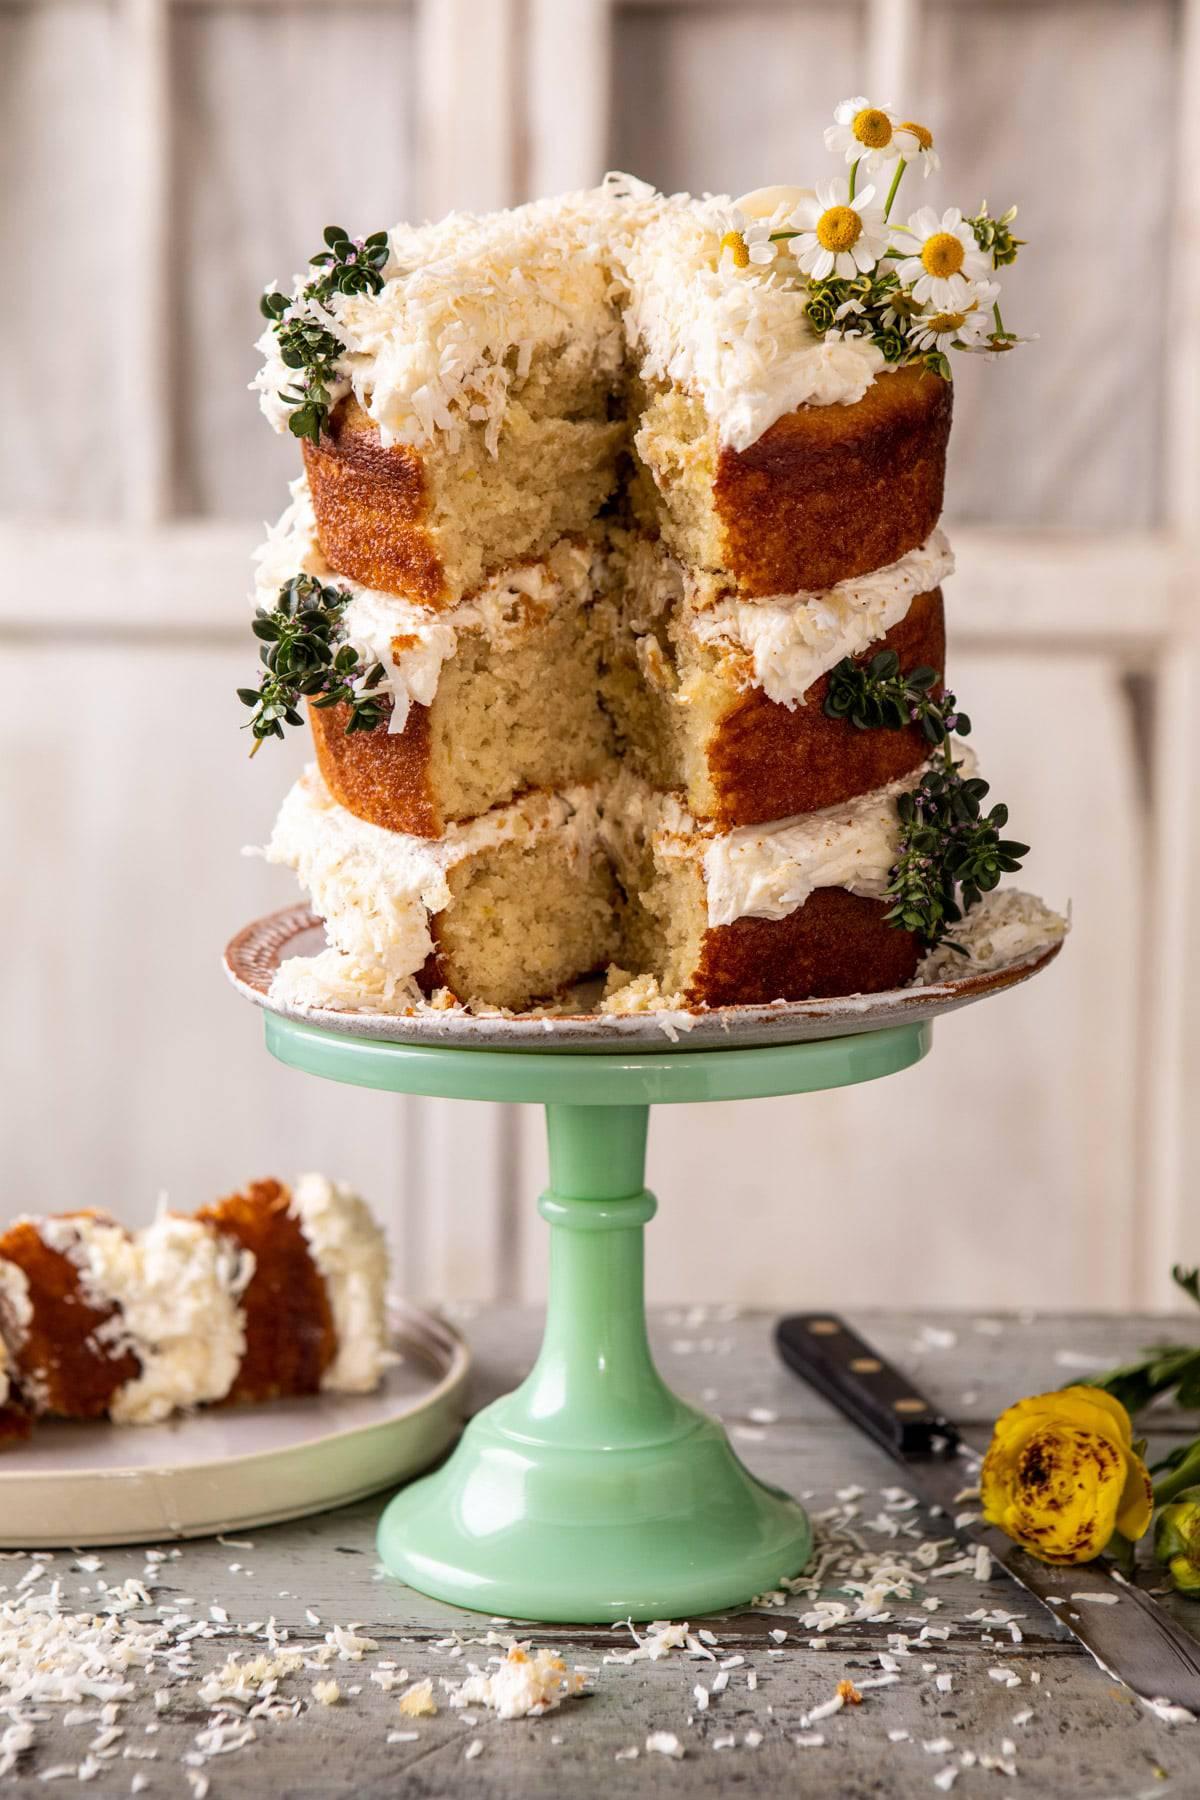 Lemon Coconut Naked Cake with Whipped Vanilla Buttercream | halfbakedharvest.com #coconutcake #springrecipes #easter #cake #layercake